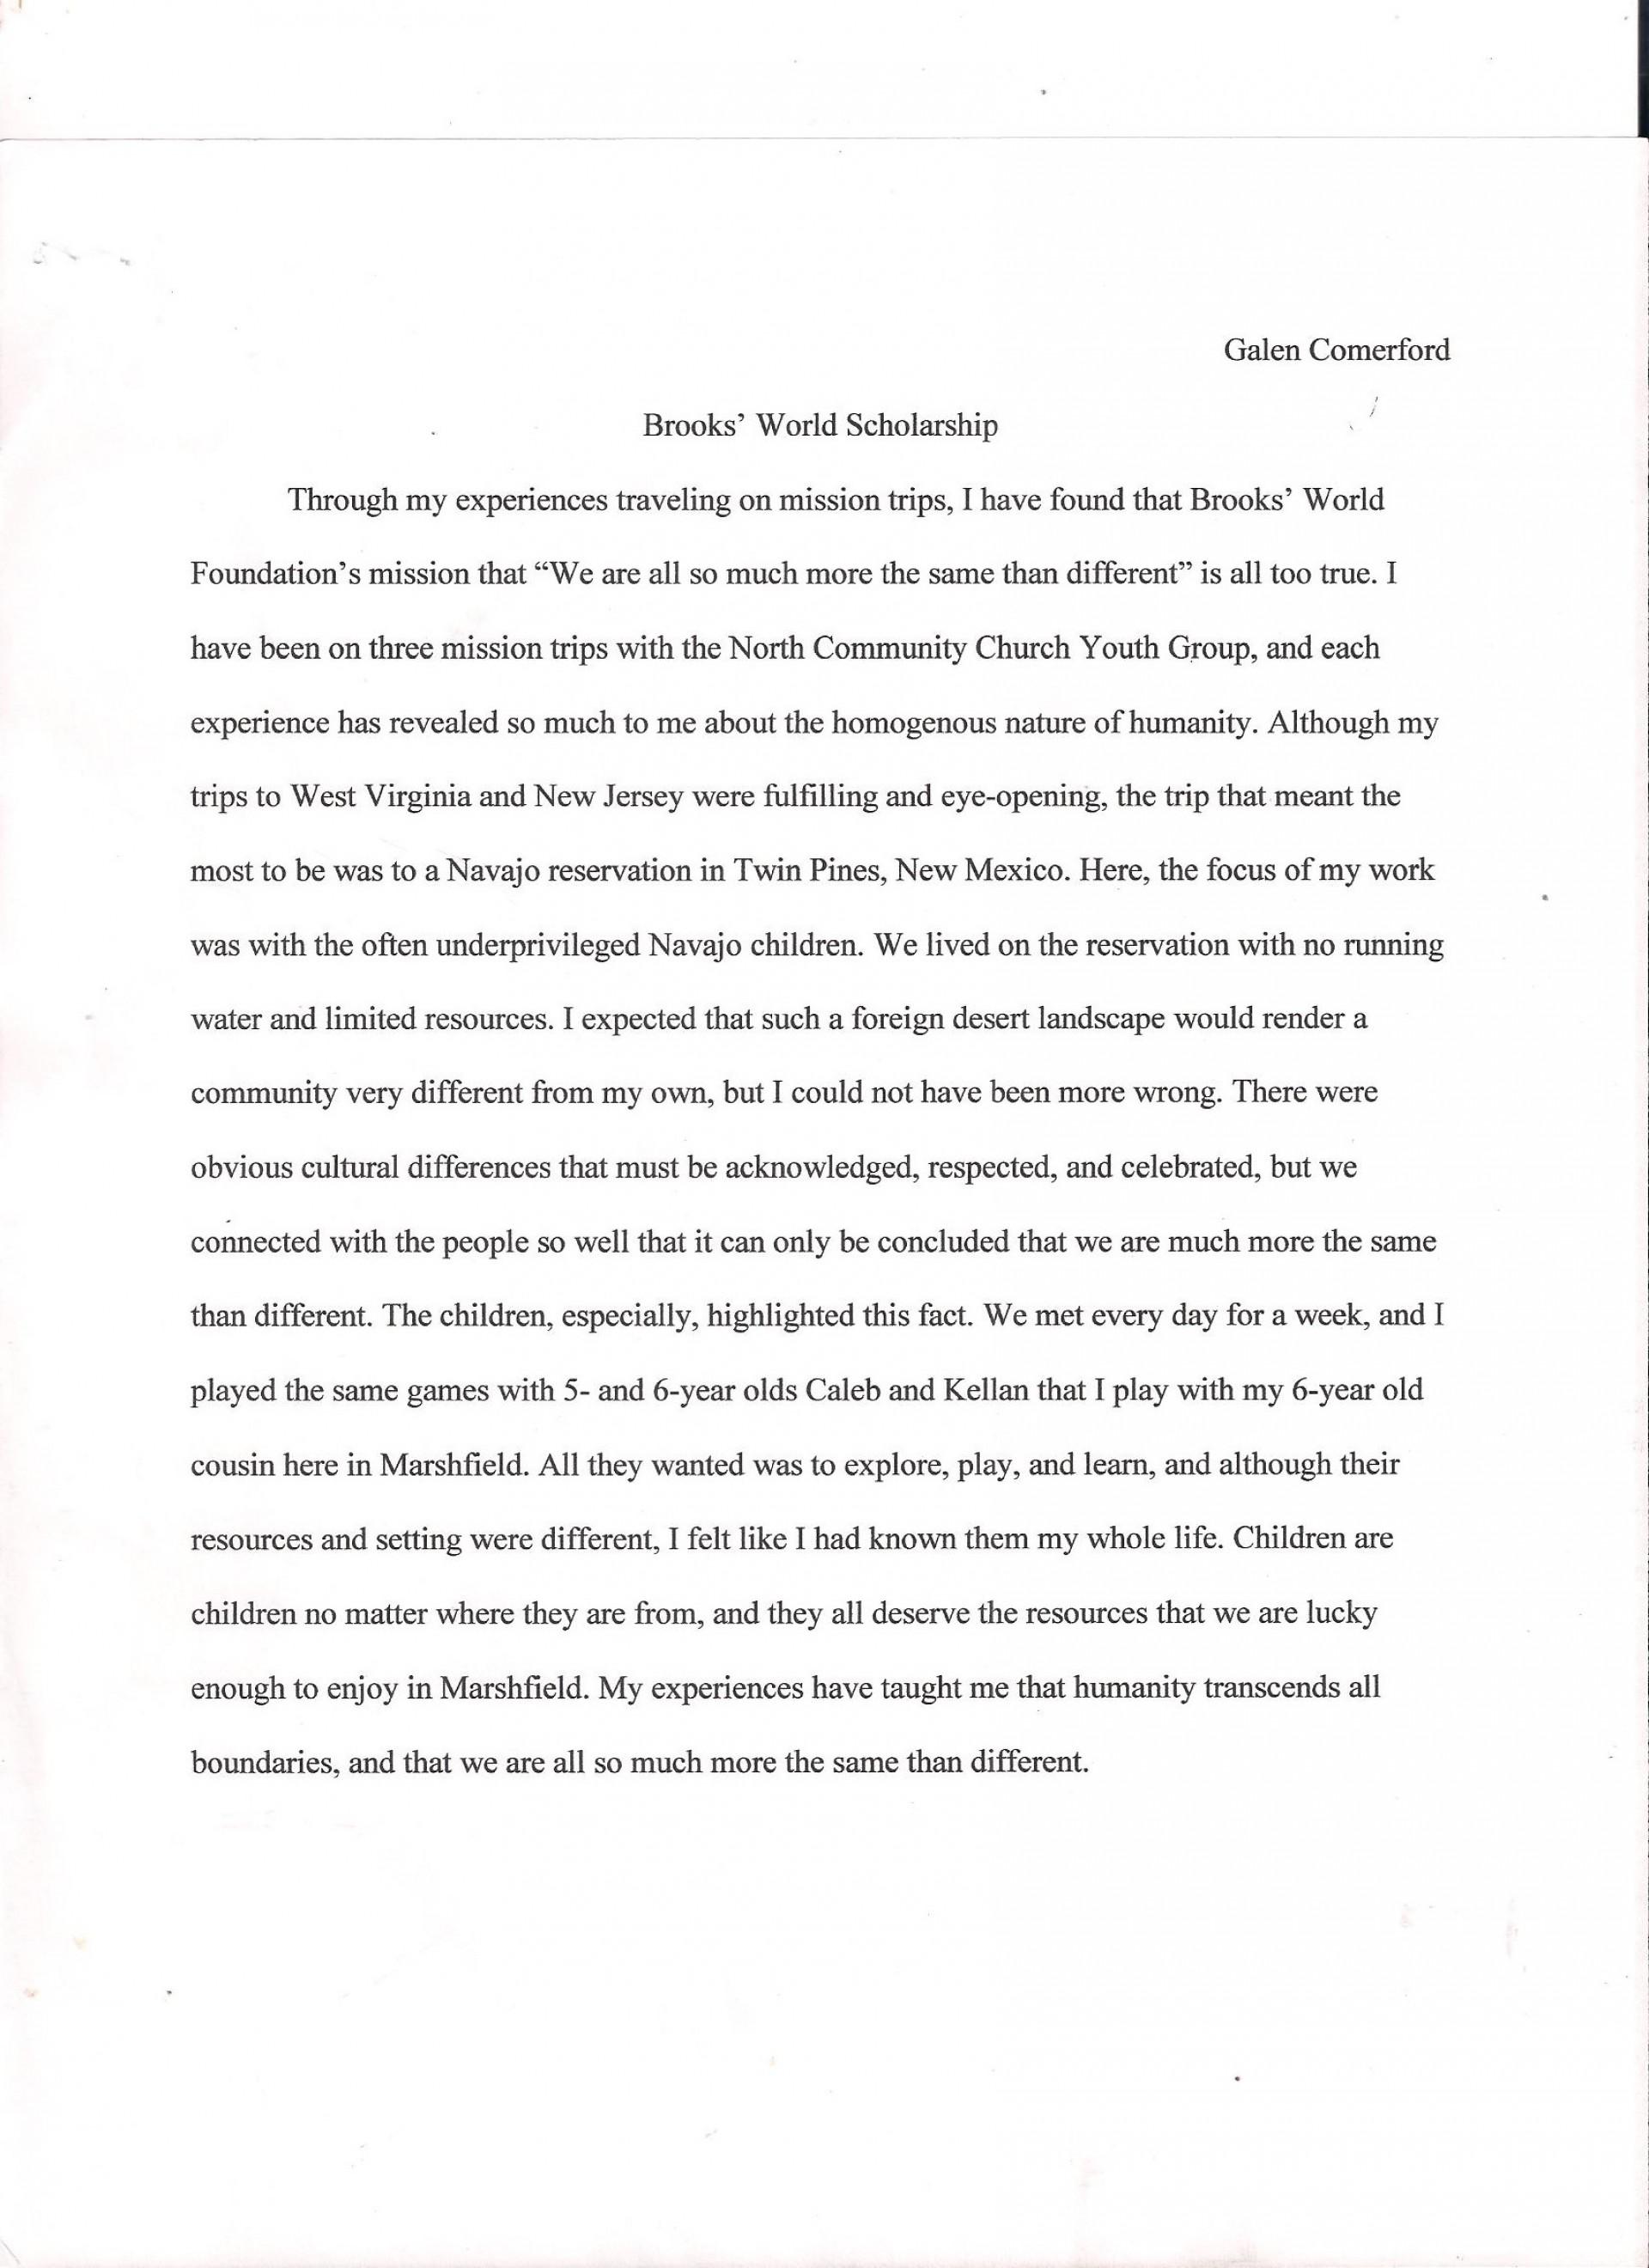 012 Image4 Career Goals Essays Imposing Essay Examples Scholarship Pdf Educational 1920